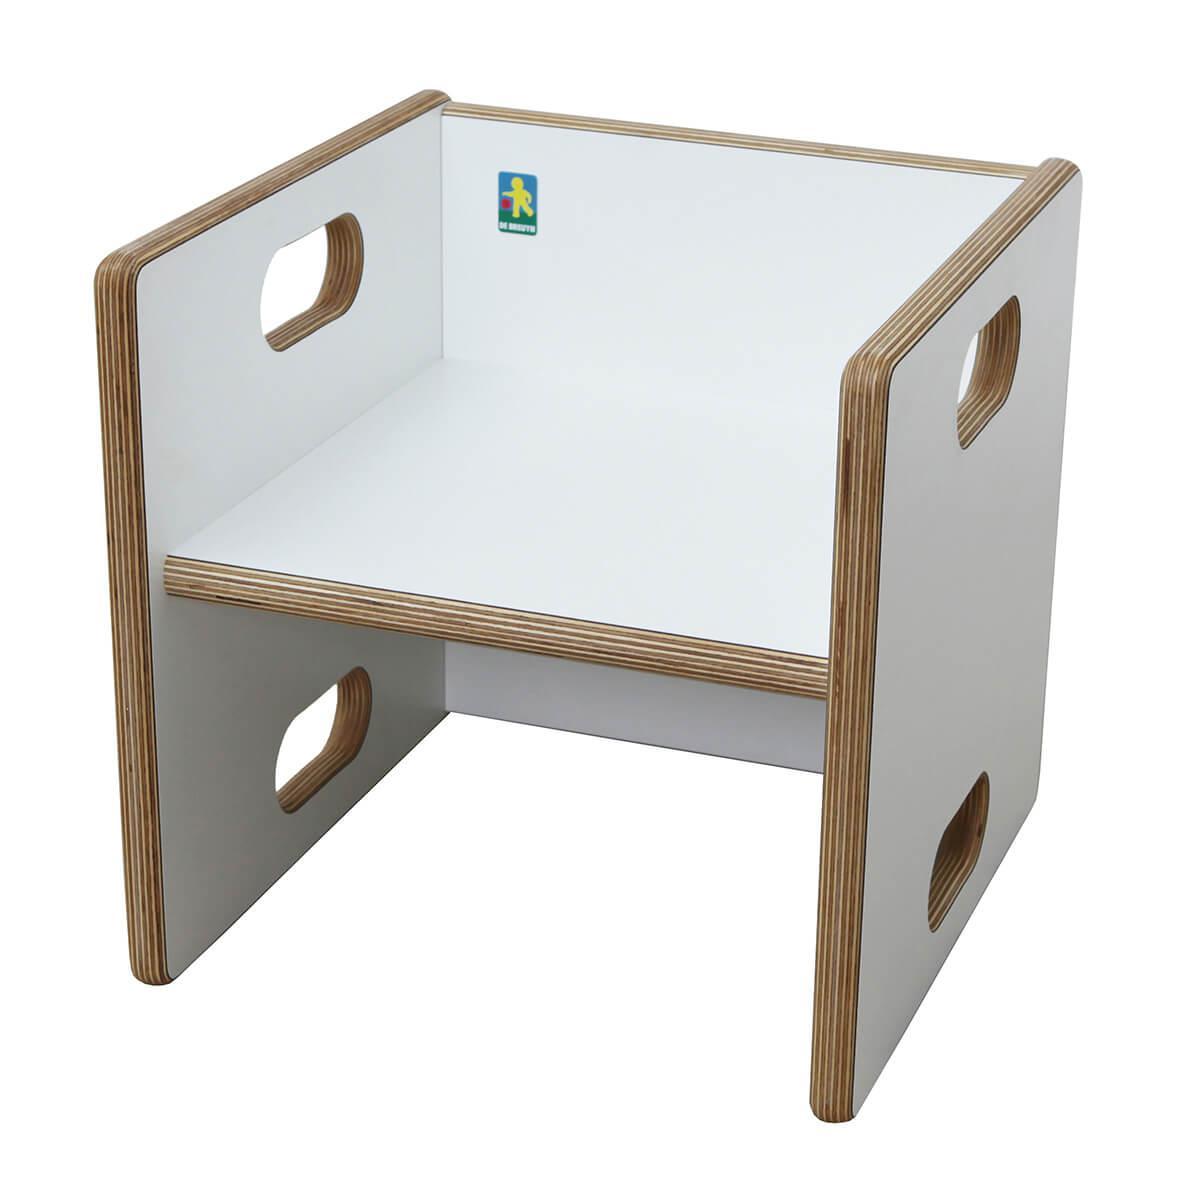 Wandelstuhl DECOR Debreuyn Multiplex weiß HPL - Sitzfläche weiß